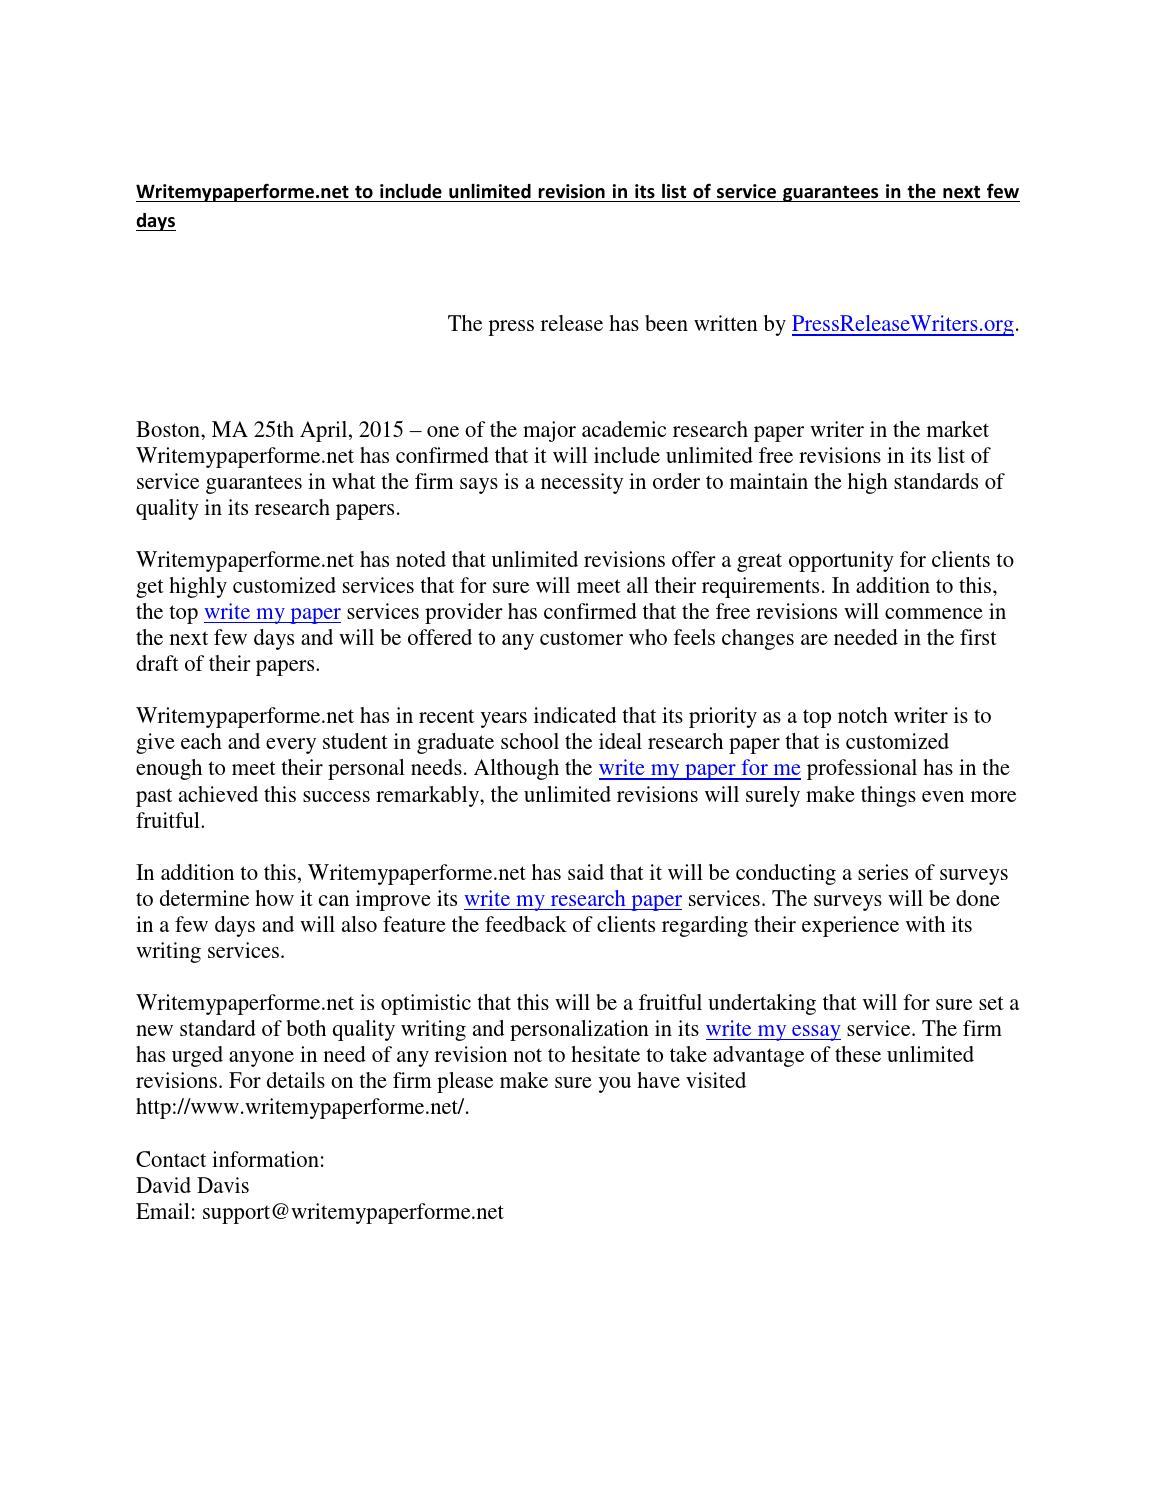 research paper publication qualitative study